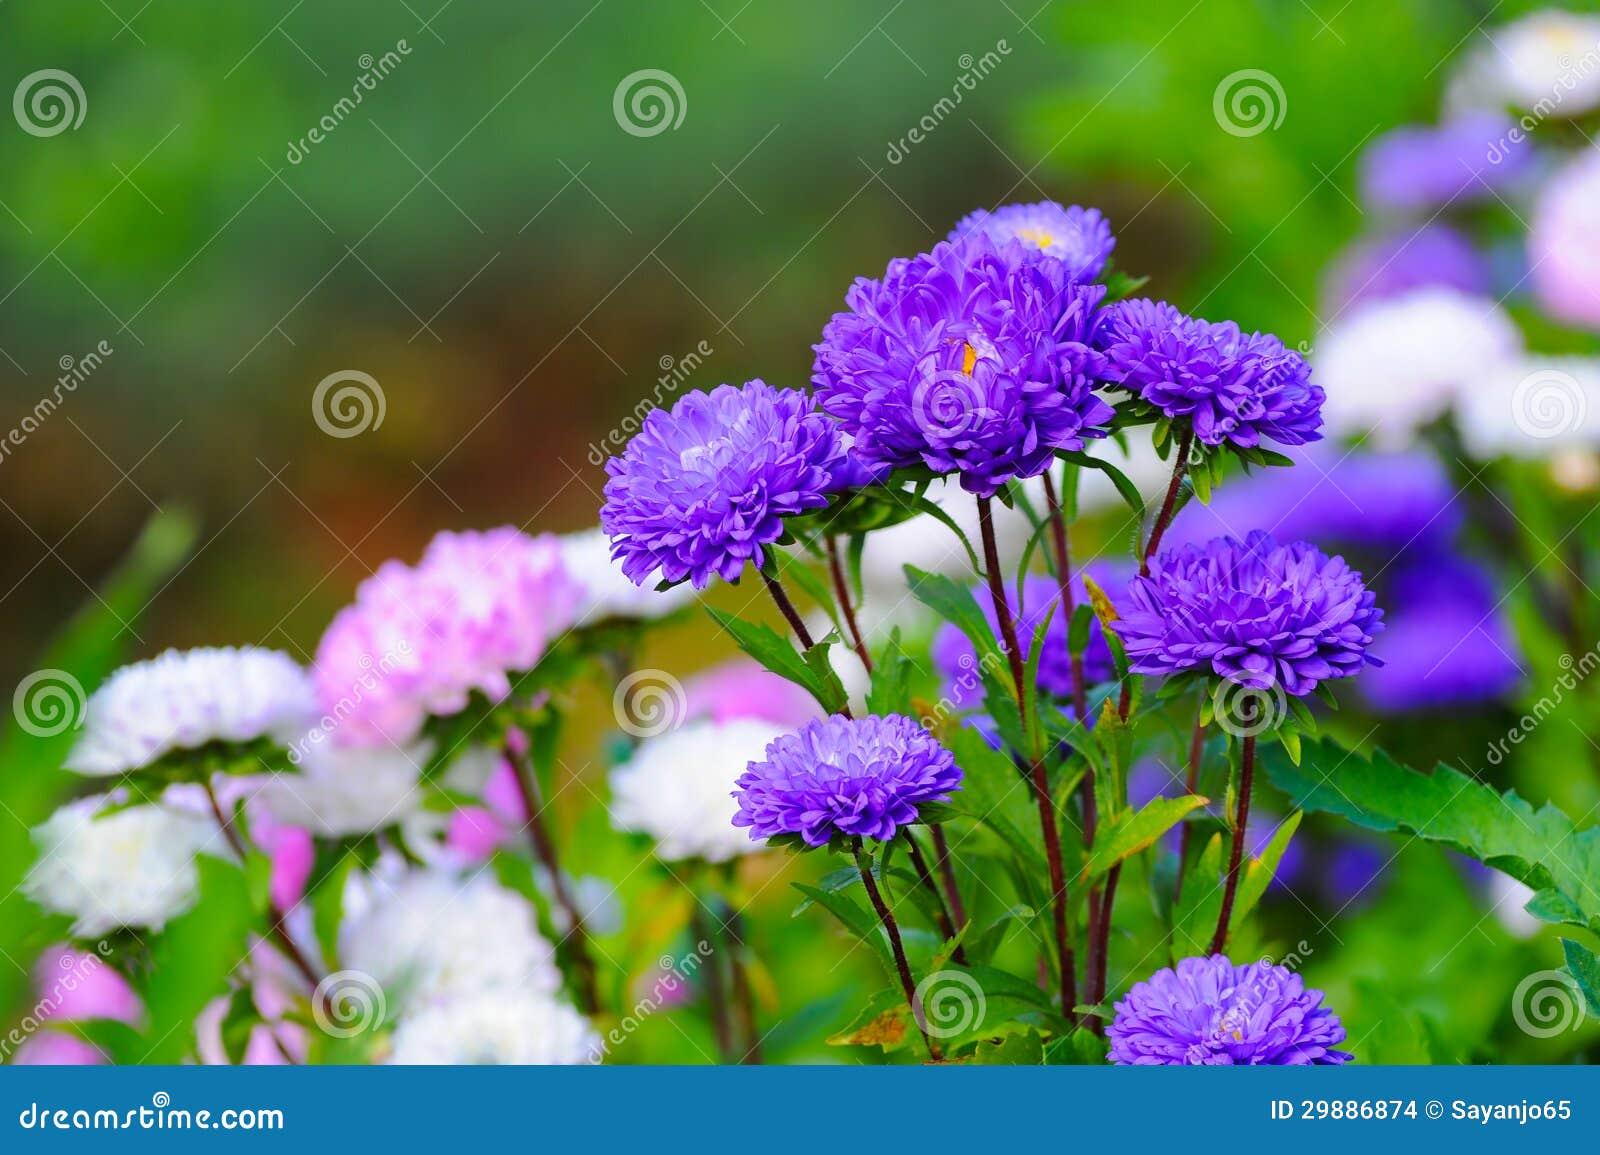 Beautiful spring flowers stock photo image of season 29886874 beautiful spring flowers mightylinksfo Gallery